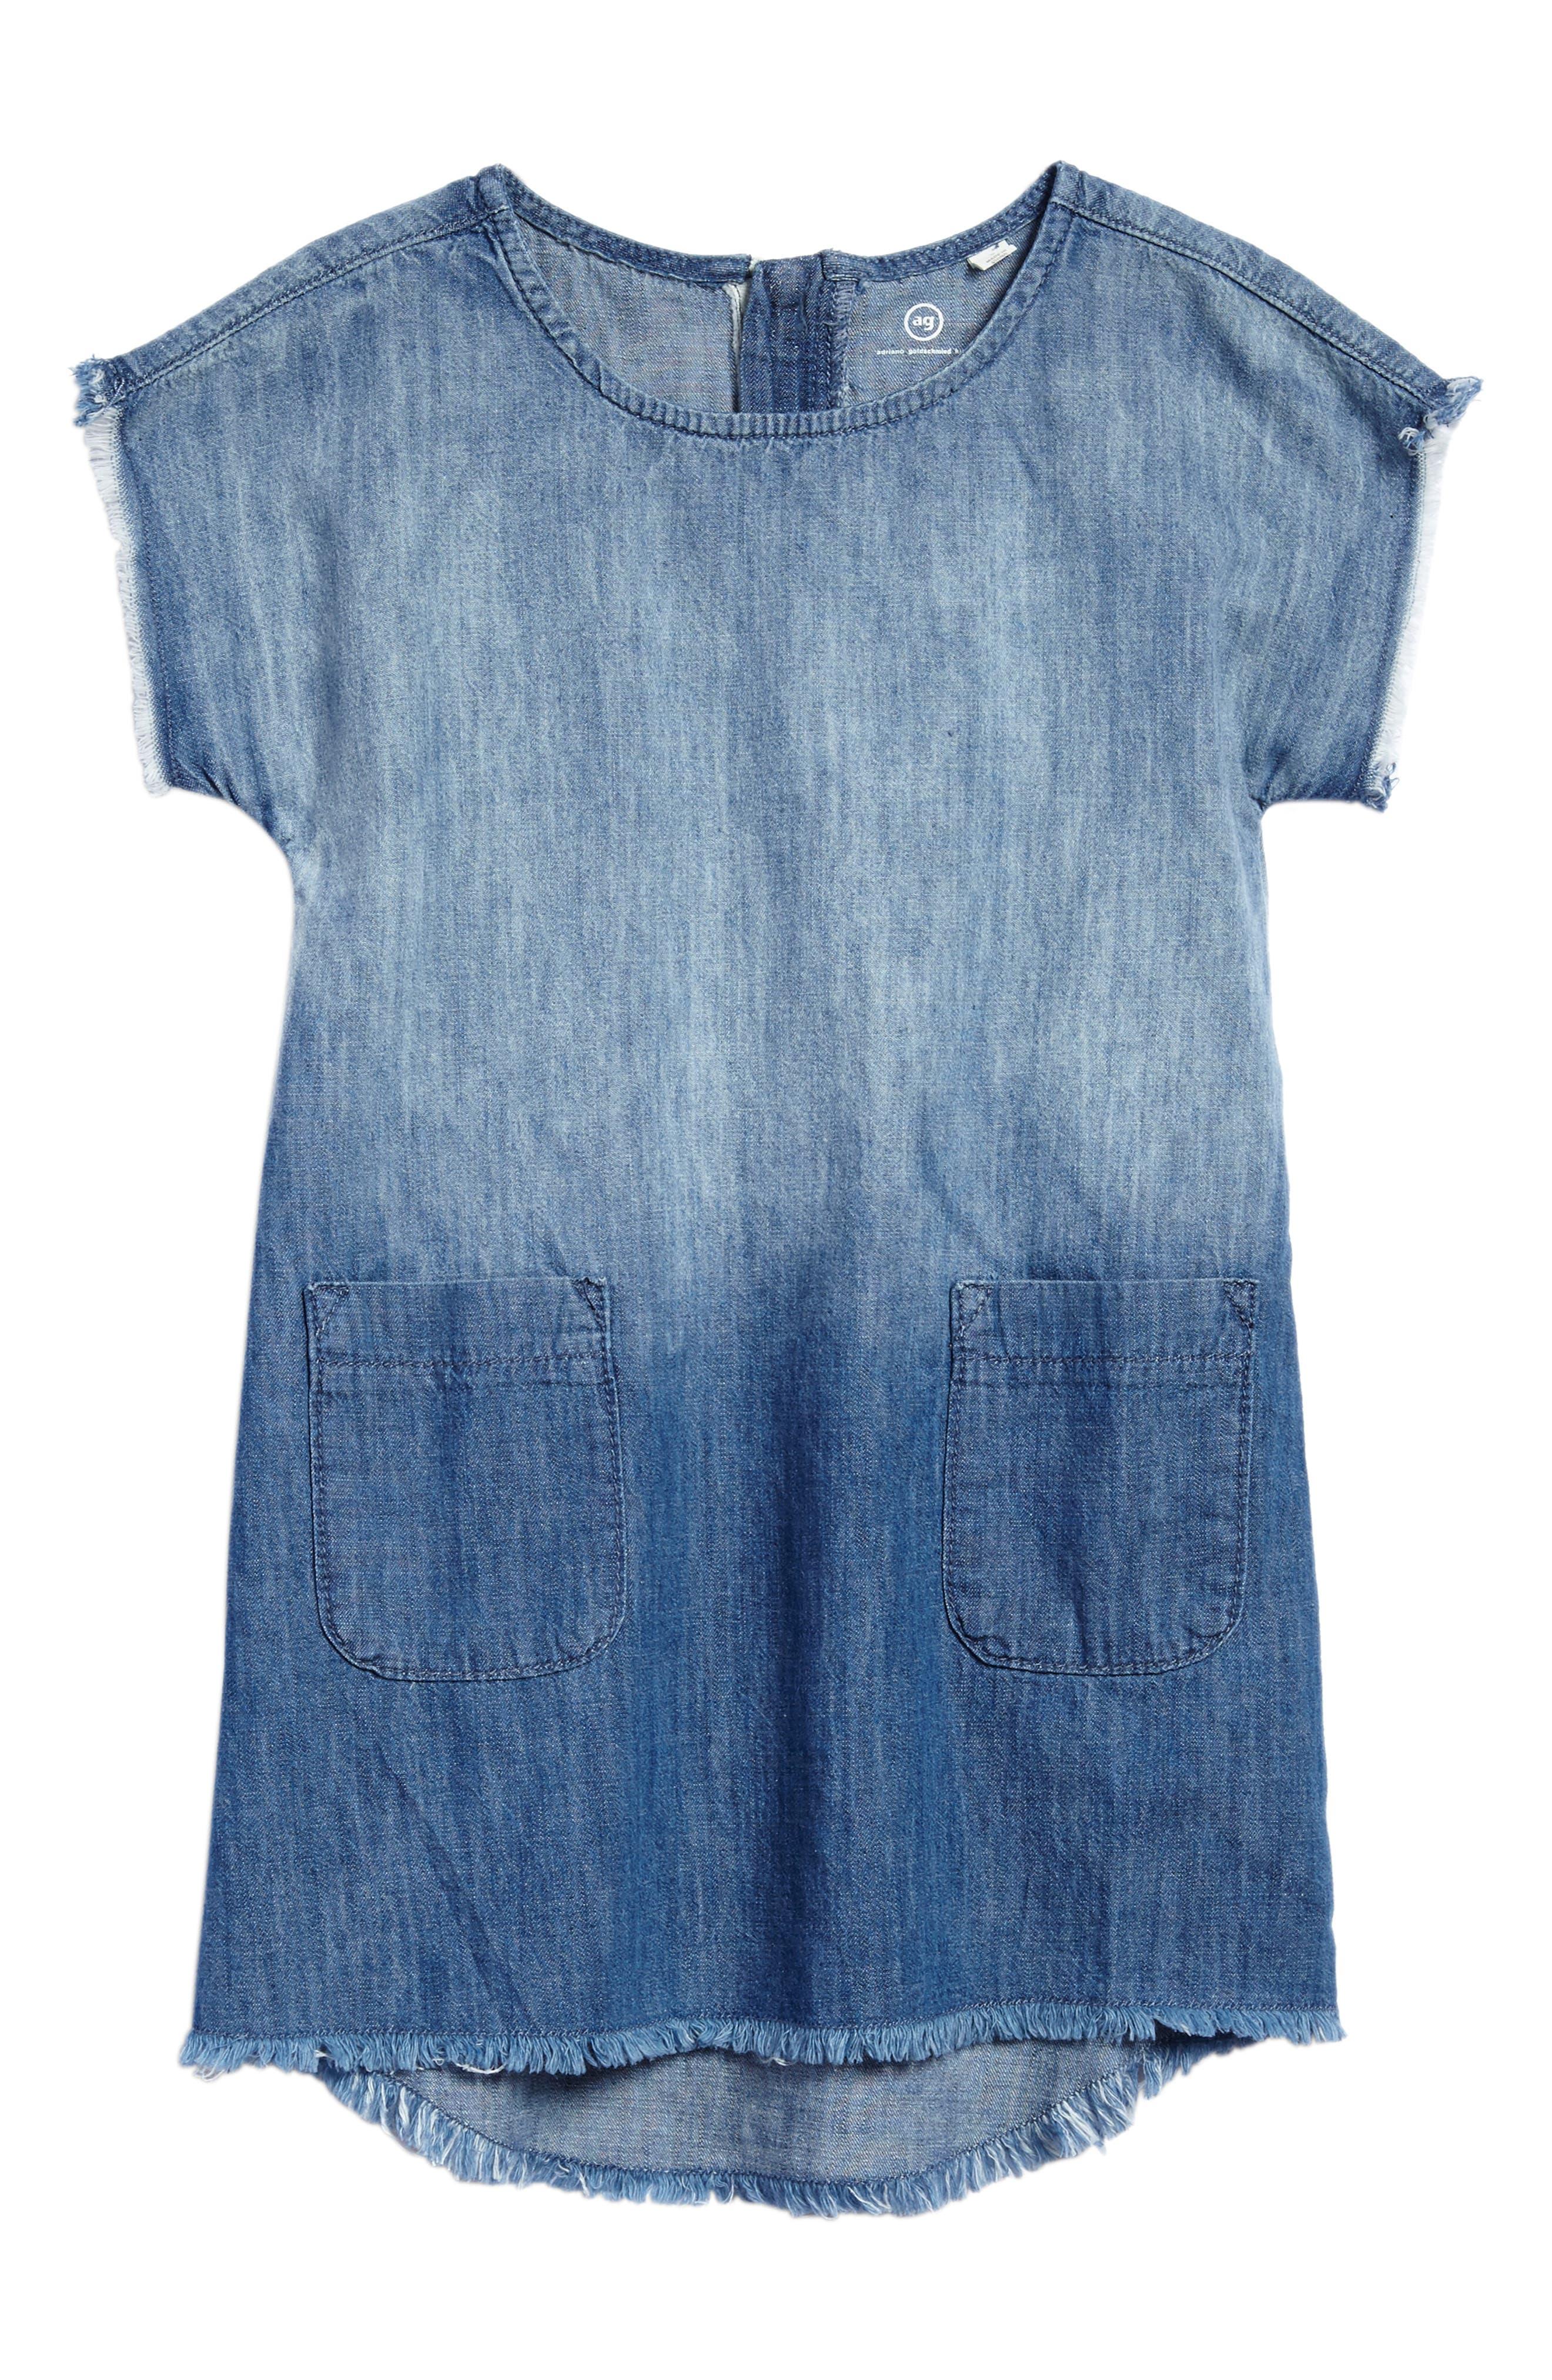 Main Image - ag adriano goldschmied kids Dip Dye Dress (Toddler Girls & Little Girls)